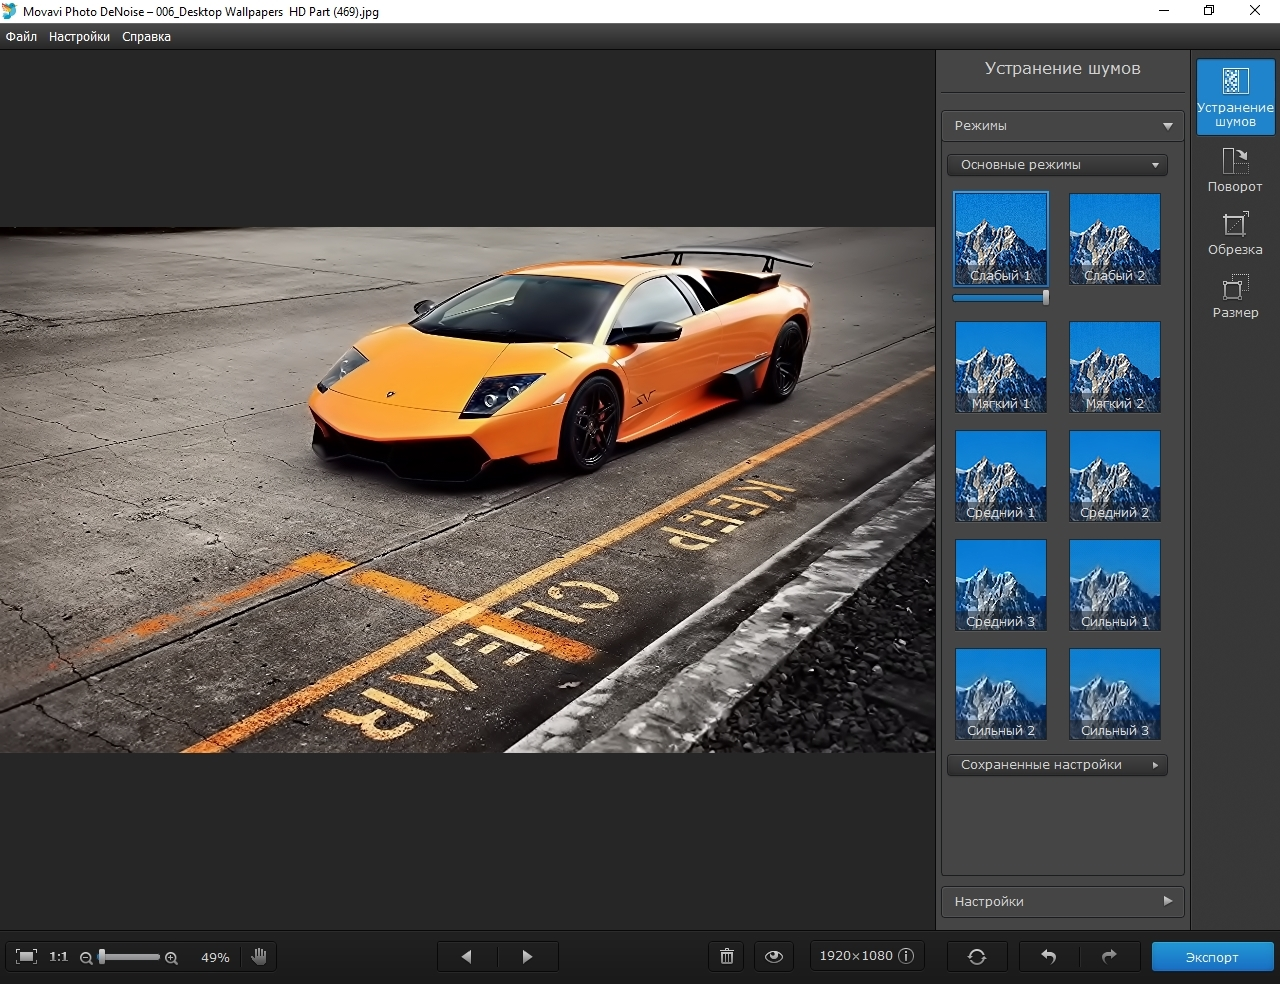 Скриншоты к Movavi Photo DeNoise 1.0.0 (2019) PC | RePack